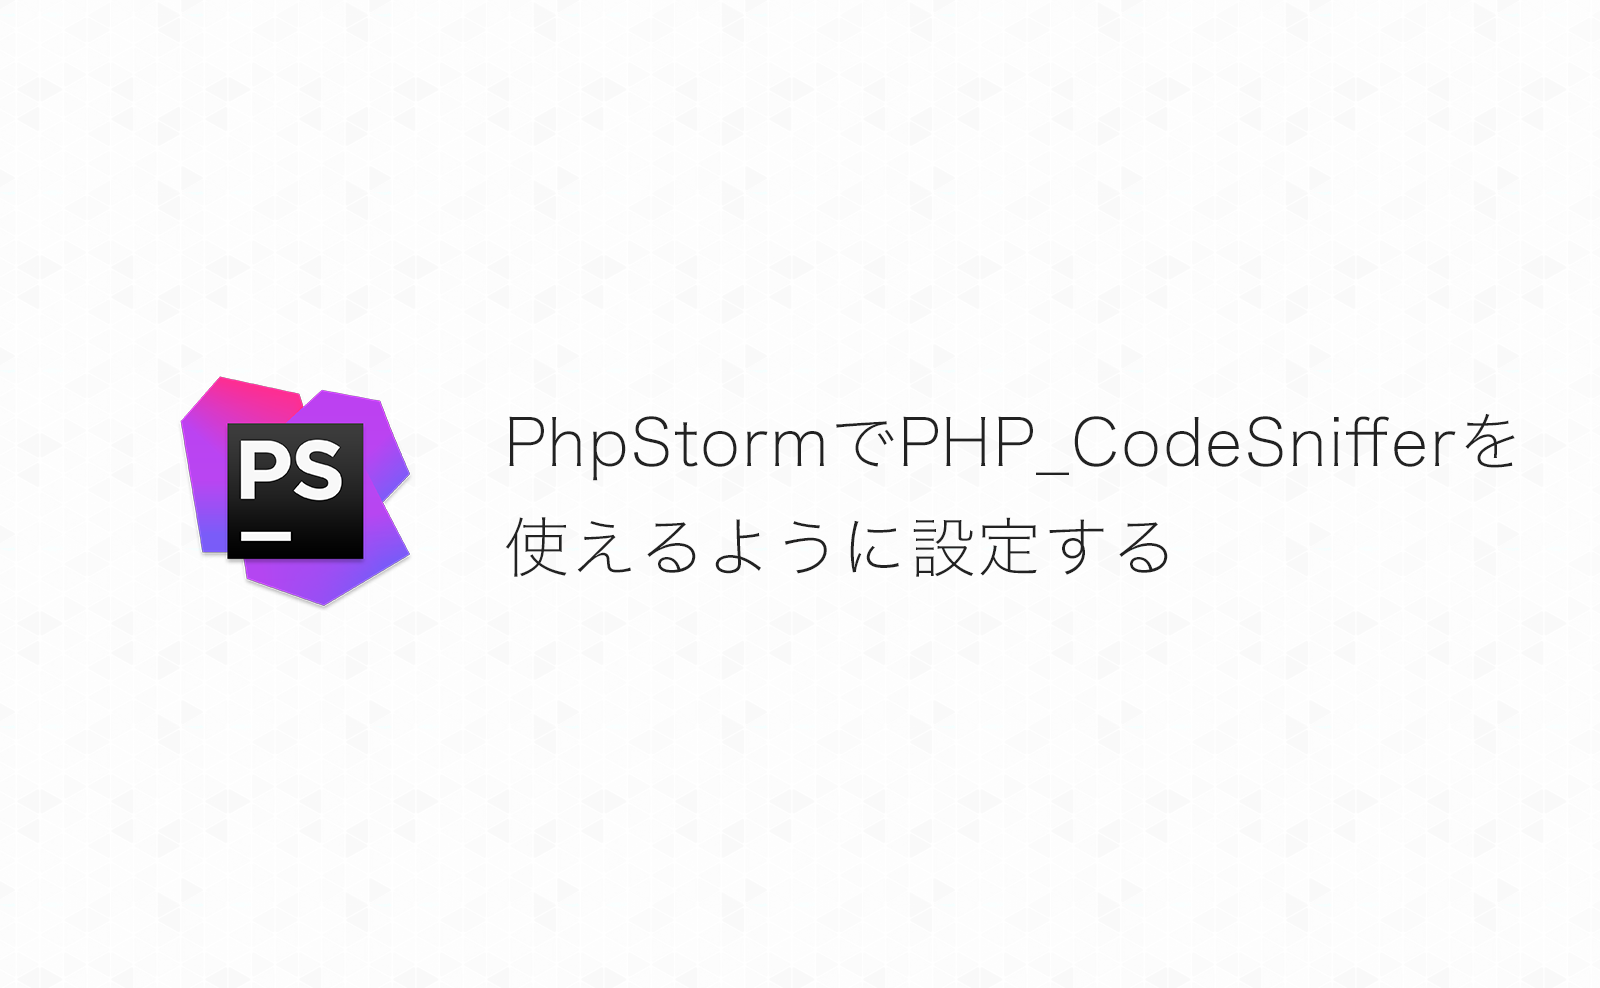 PhpStormでPHP_CodeSnifferを使えるようにしてWordPressのコーディング規約チェックするための環境作成メモ